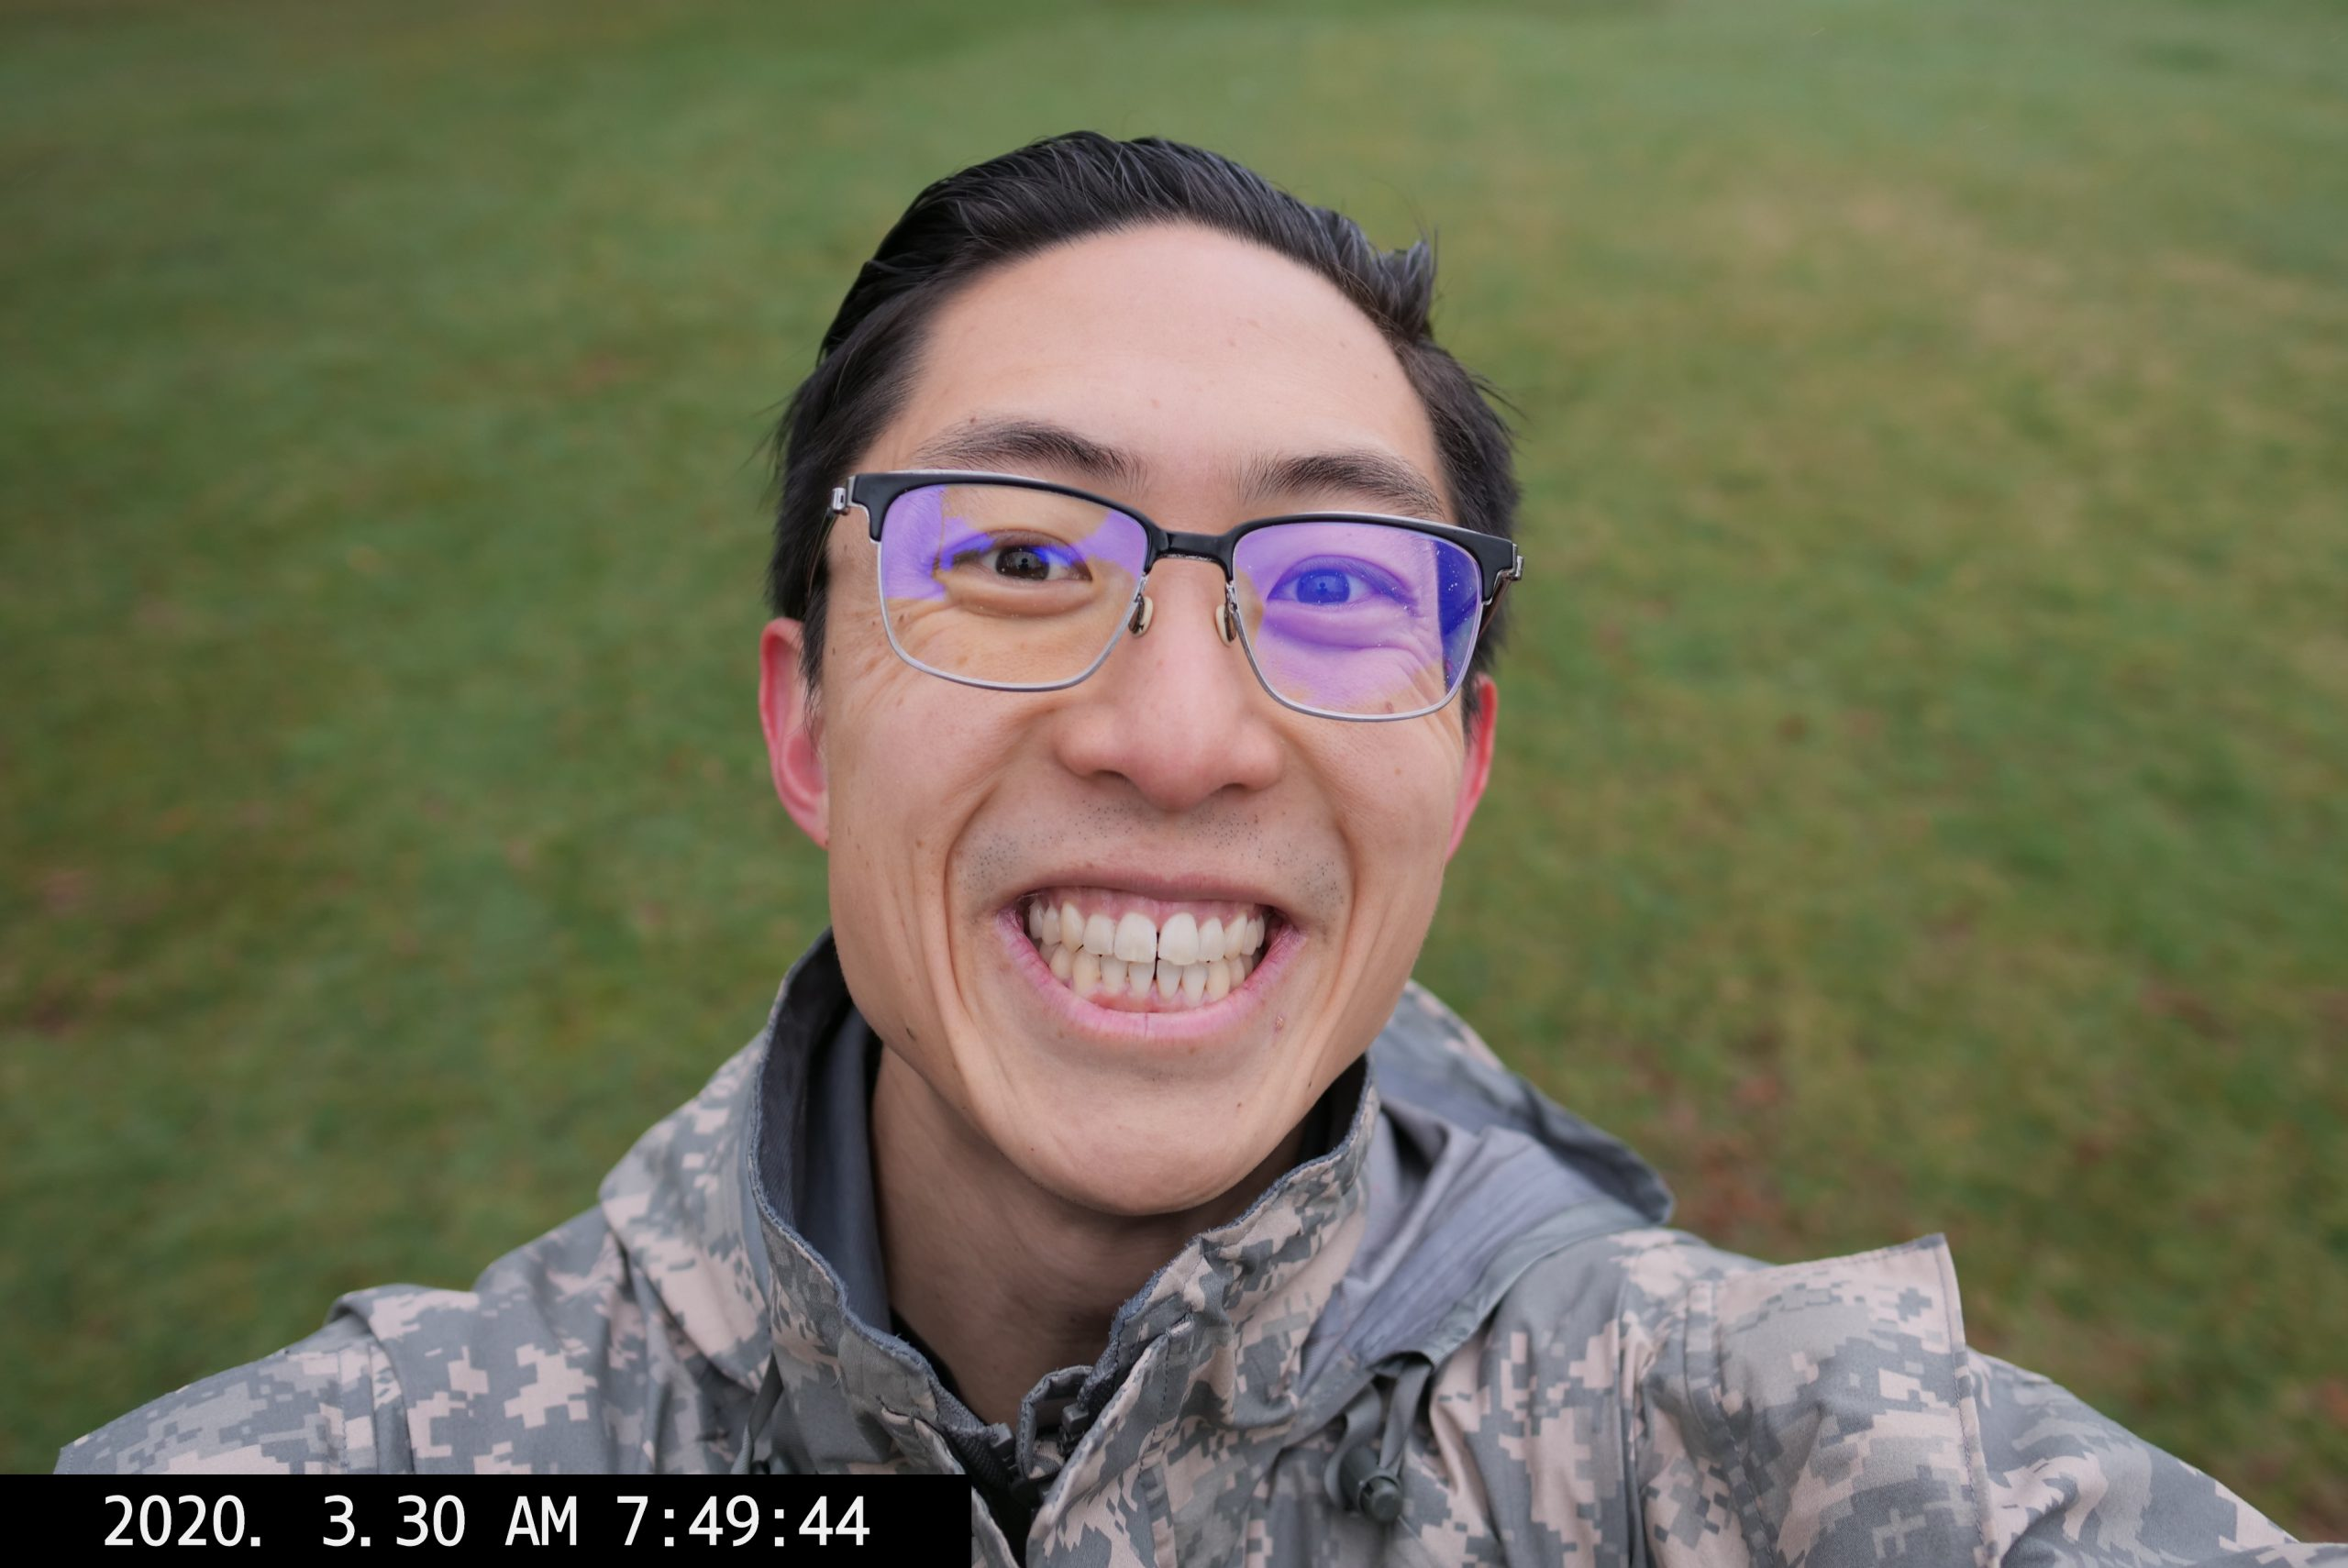 P1450887 PICK SMILE SELFIE